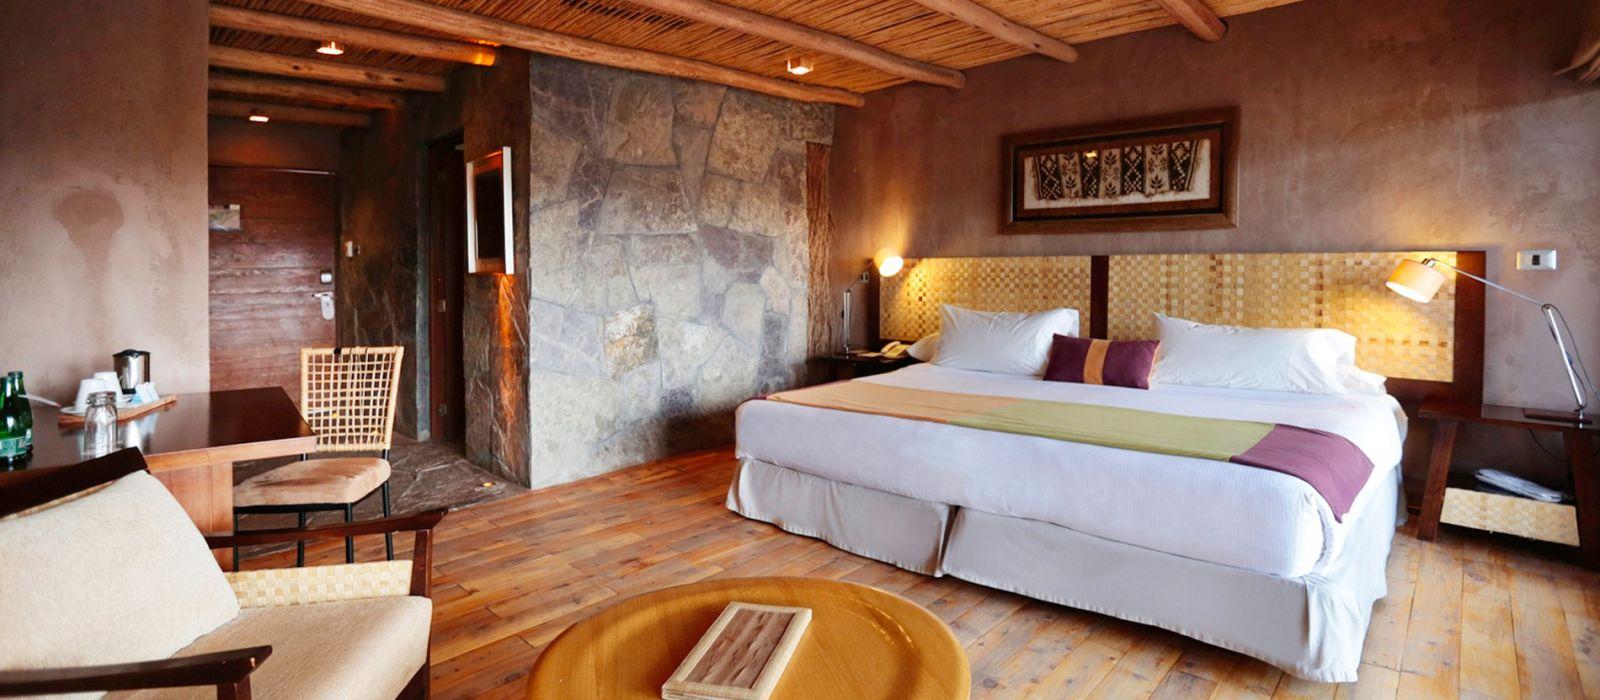 Hotel Cumbres San Pedro de Atacama Chile